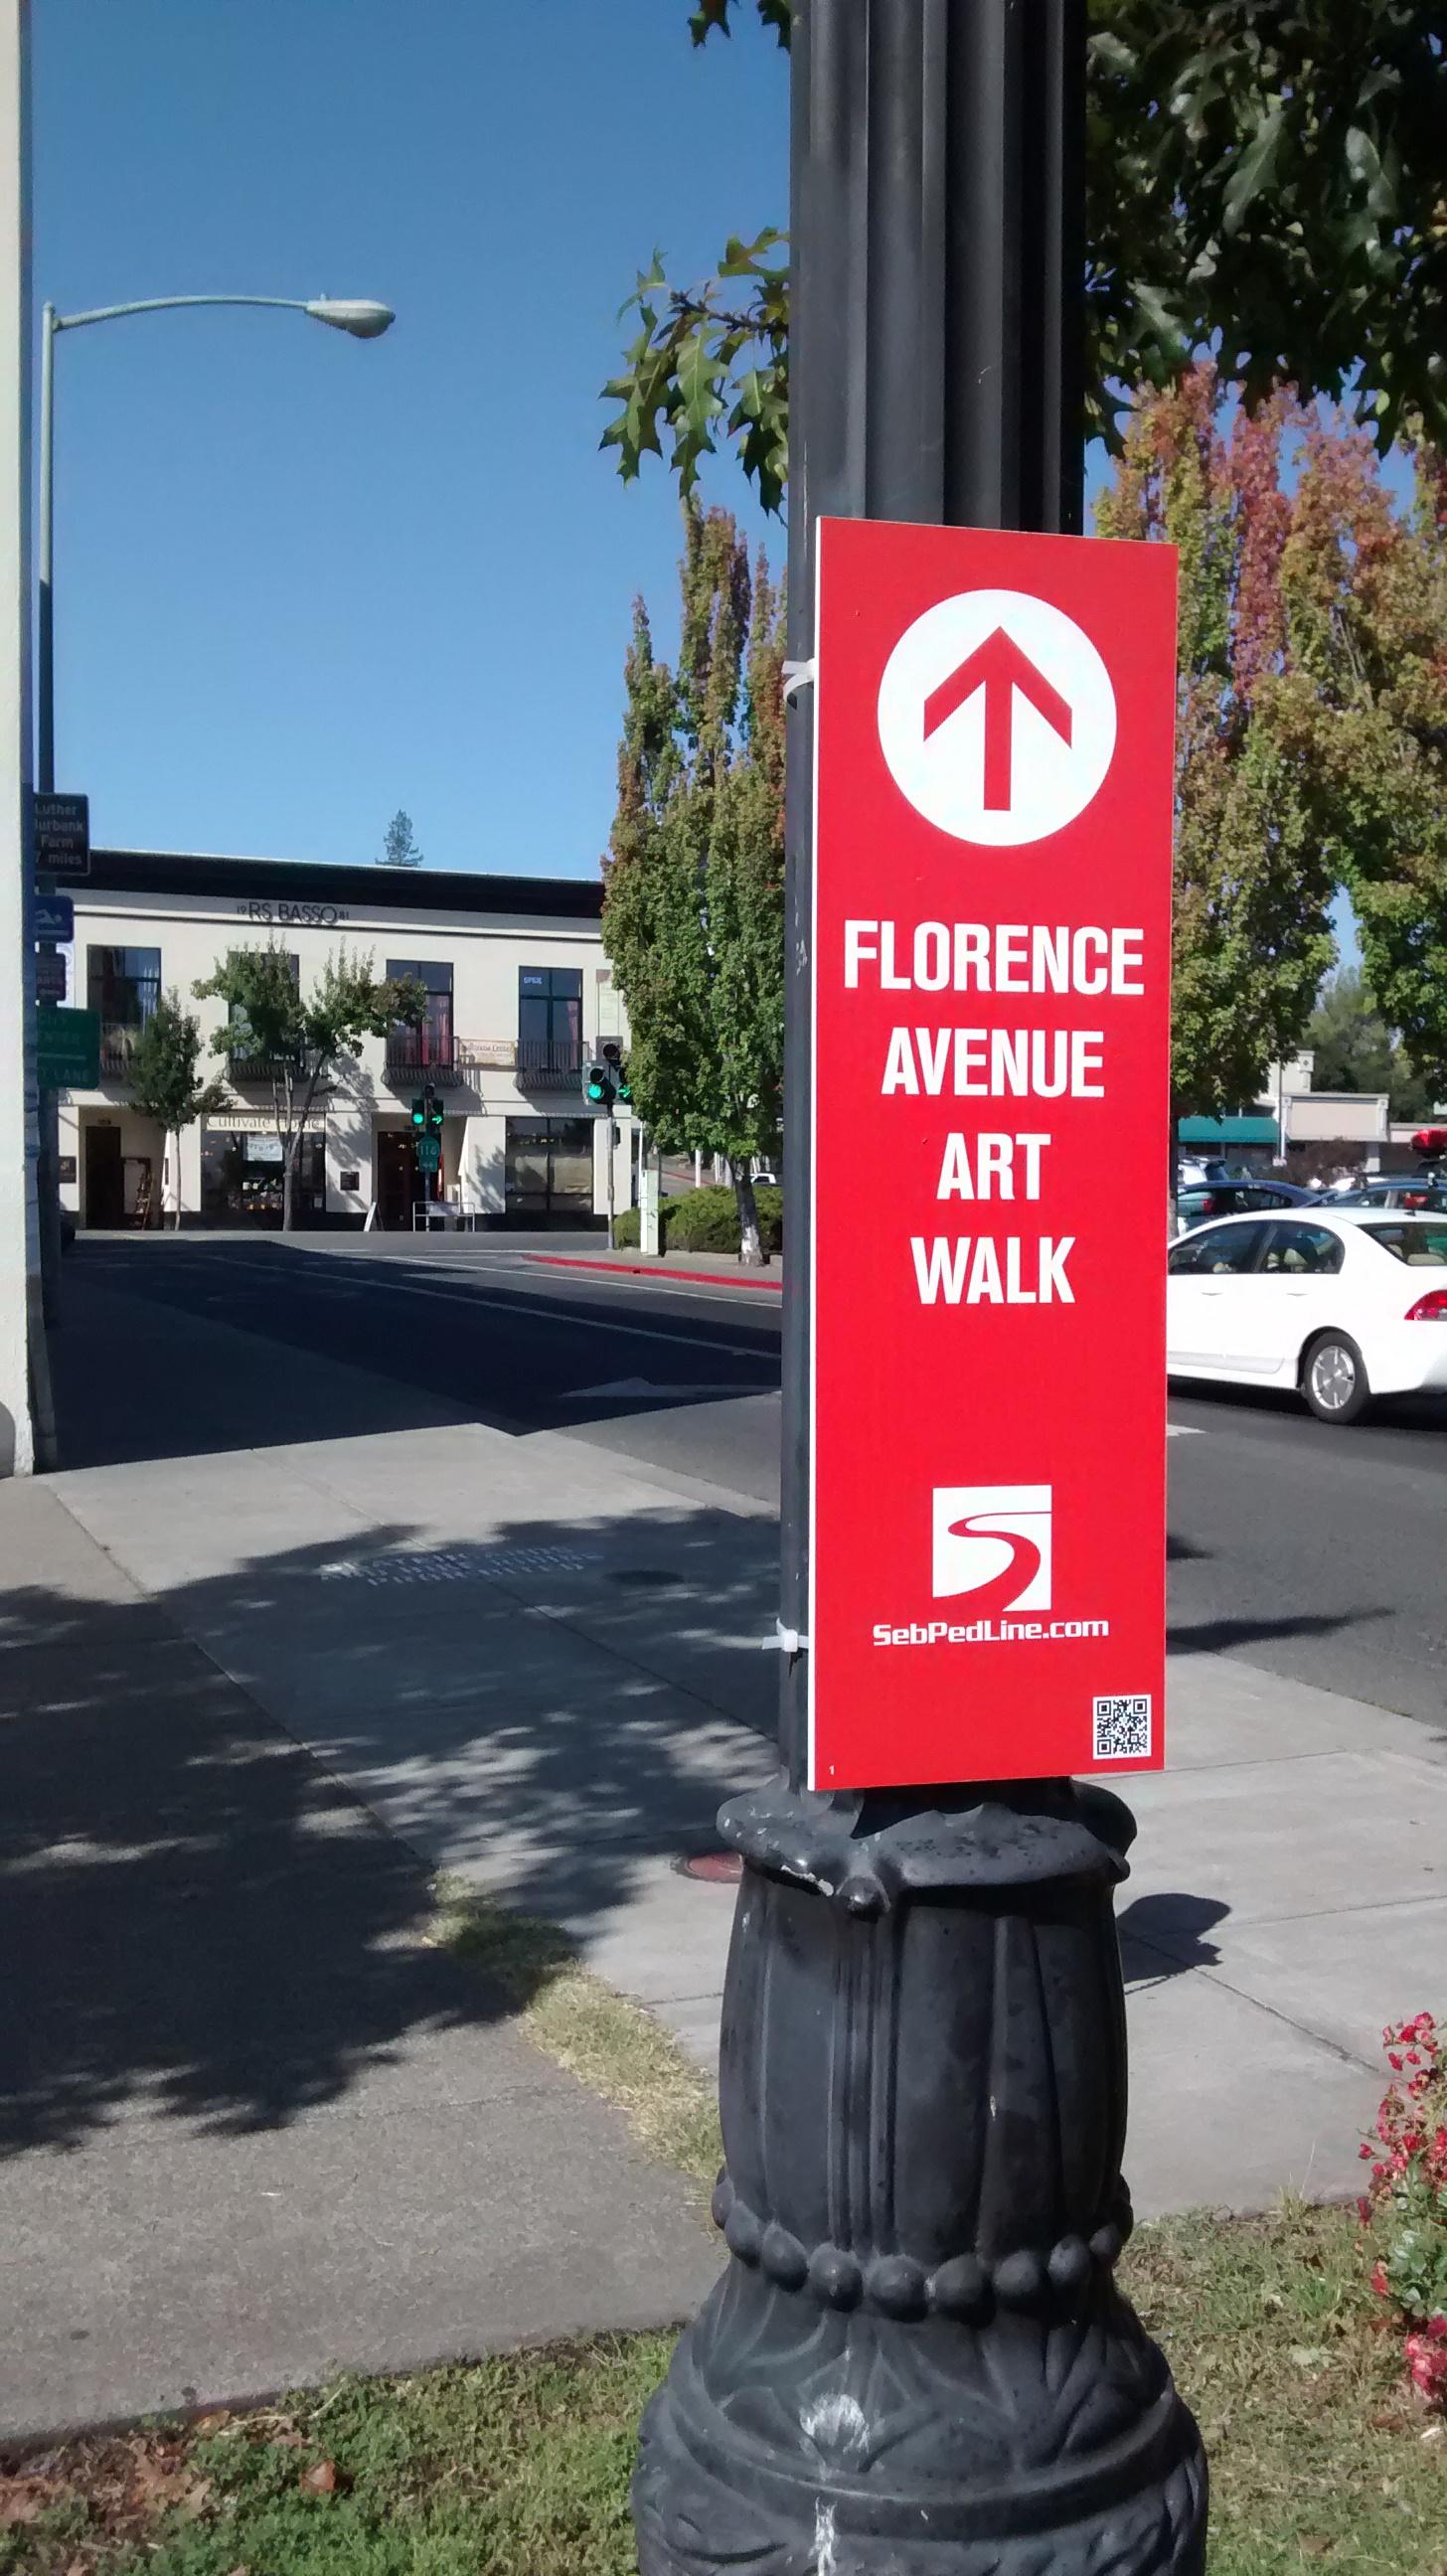 The Florence Avenue Art Walk